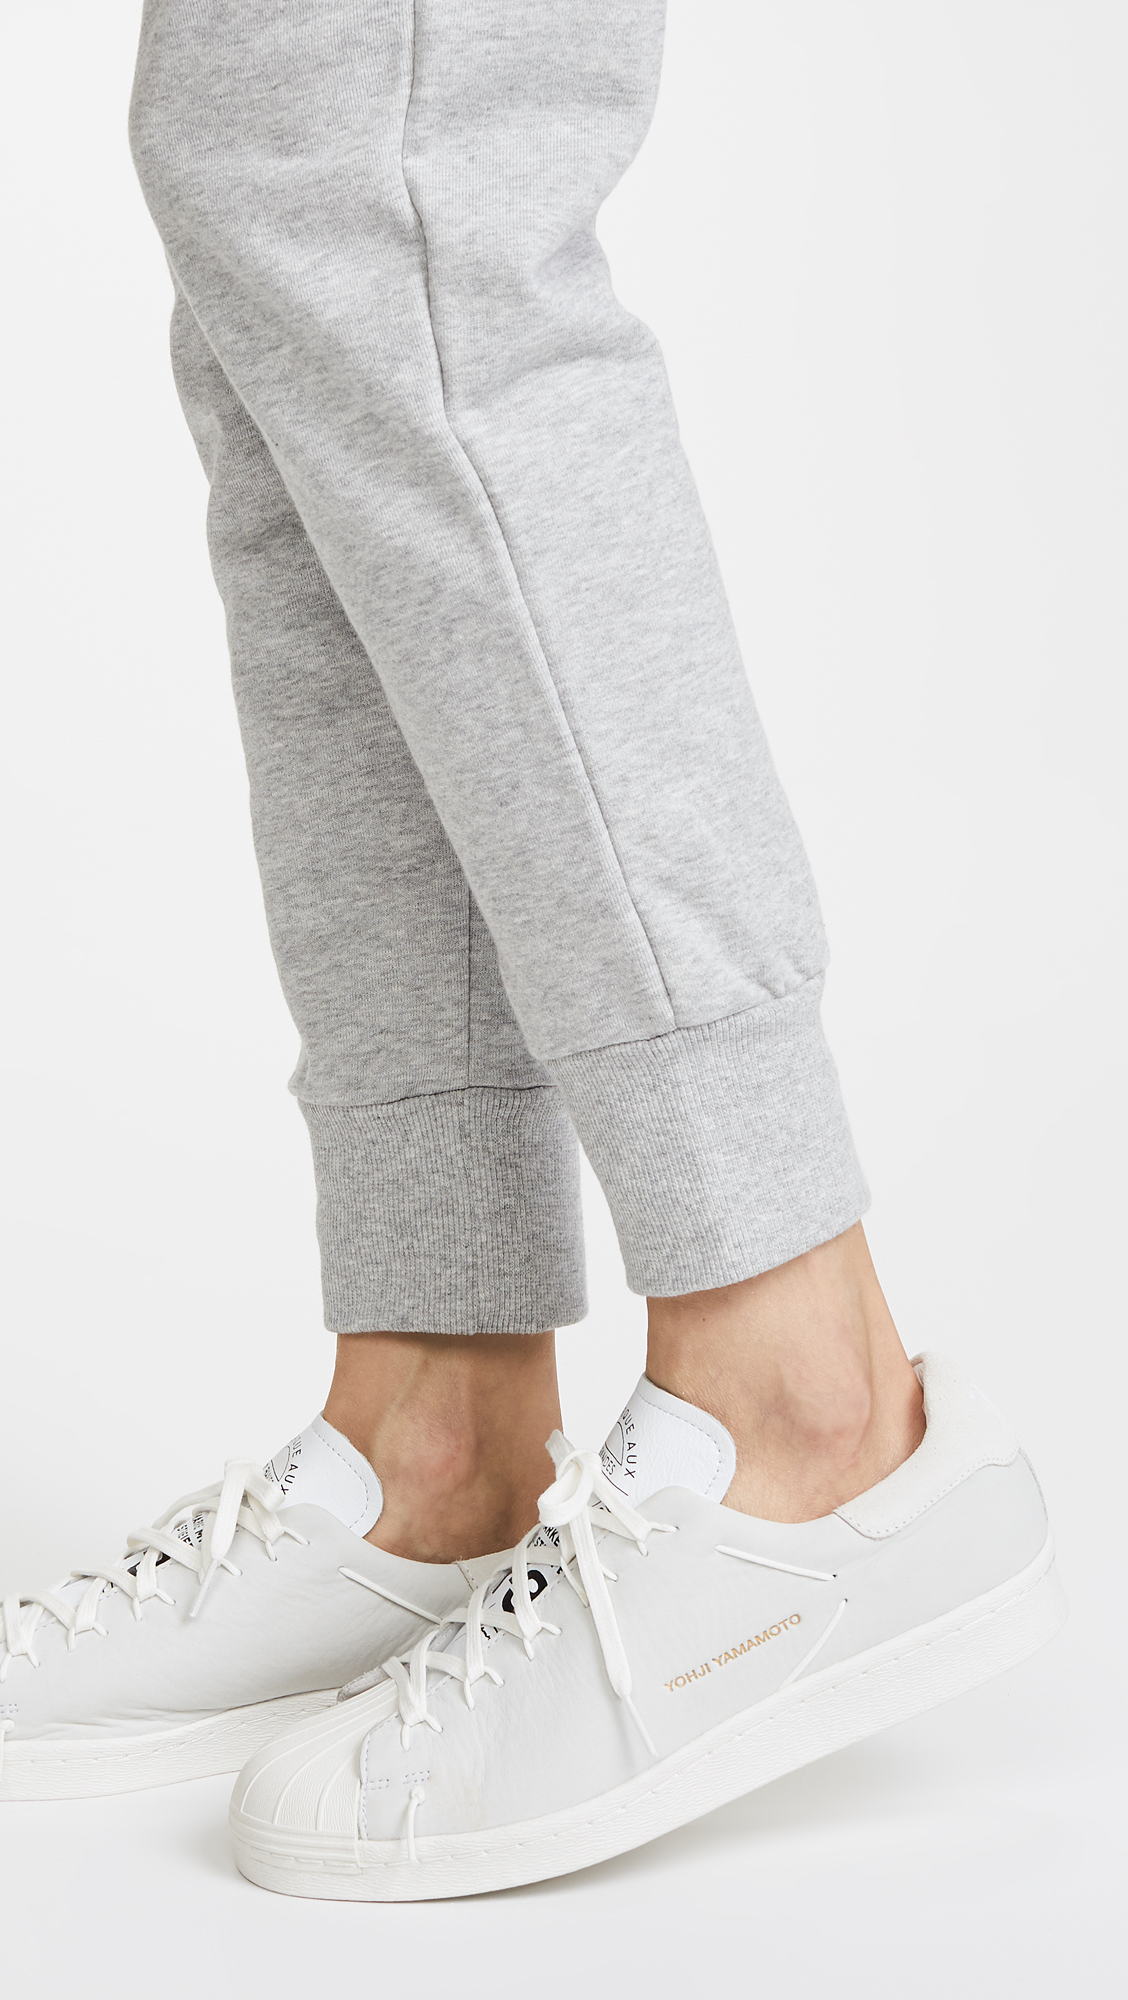 4239b1c29 Y-3 Y-3 Super Knot Sneakers